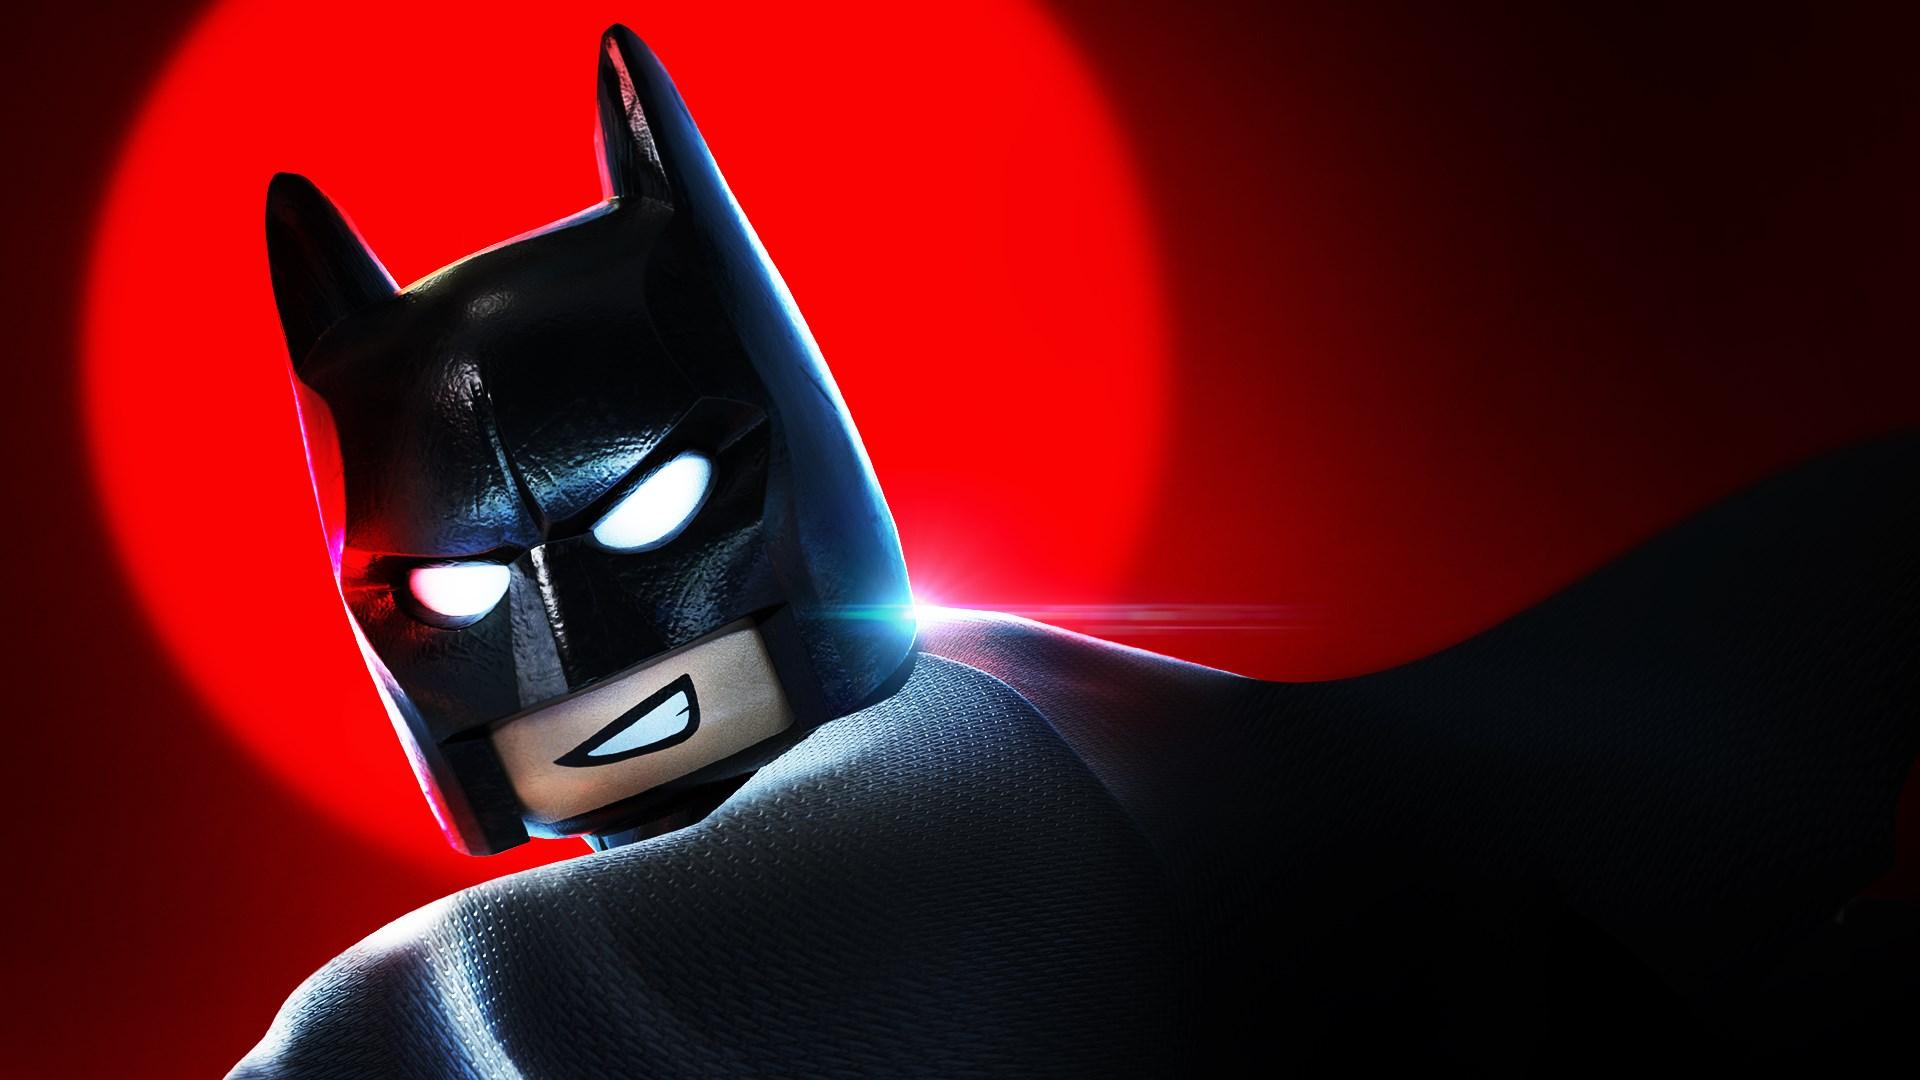 Buy Lego Dc Super Villains Batman The Animated Series